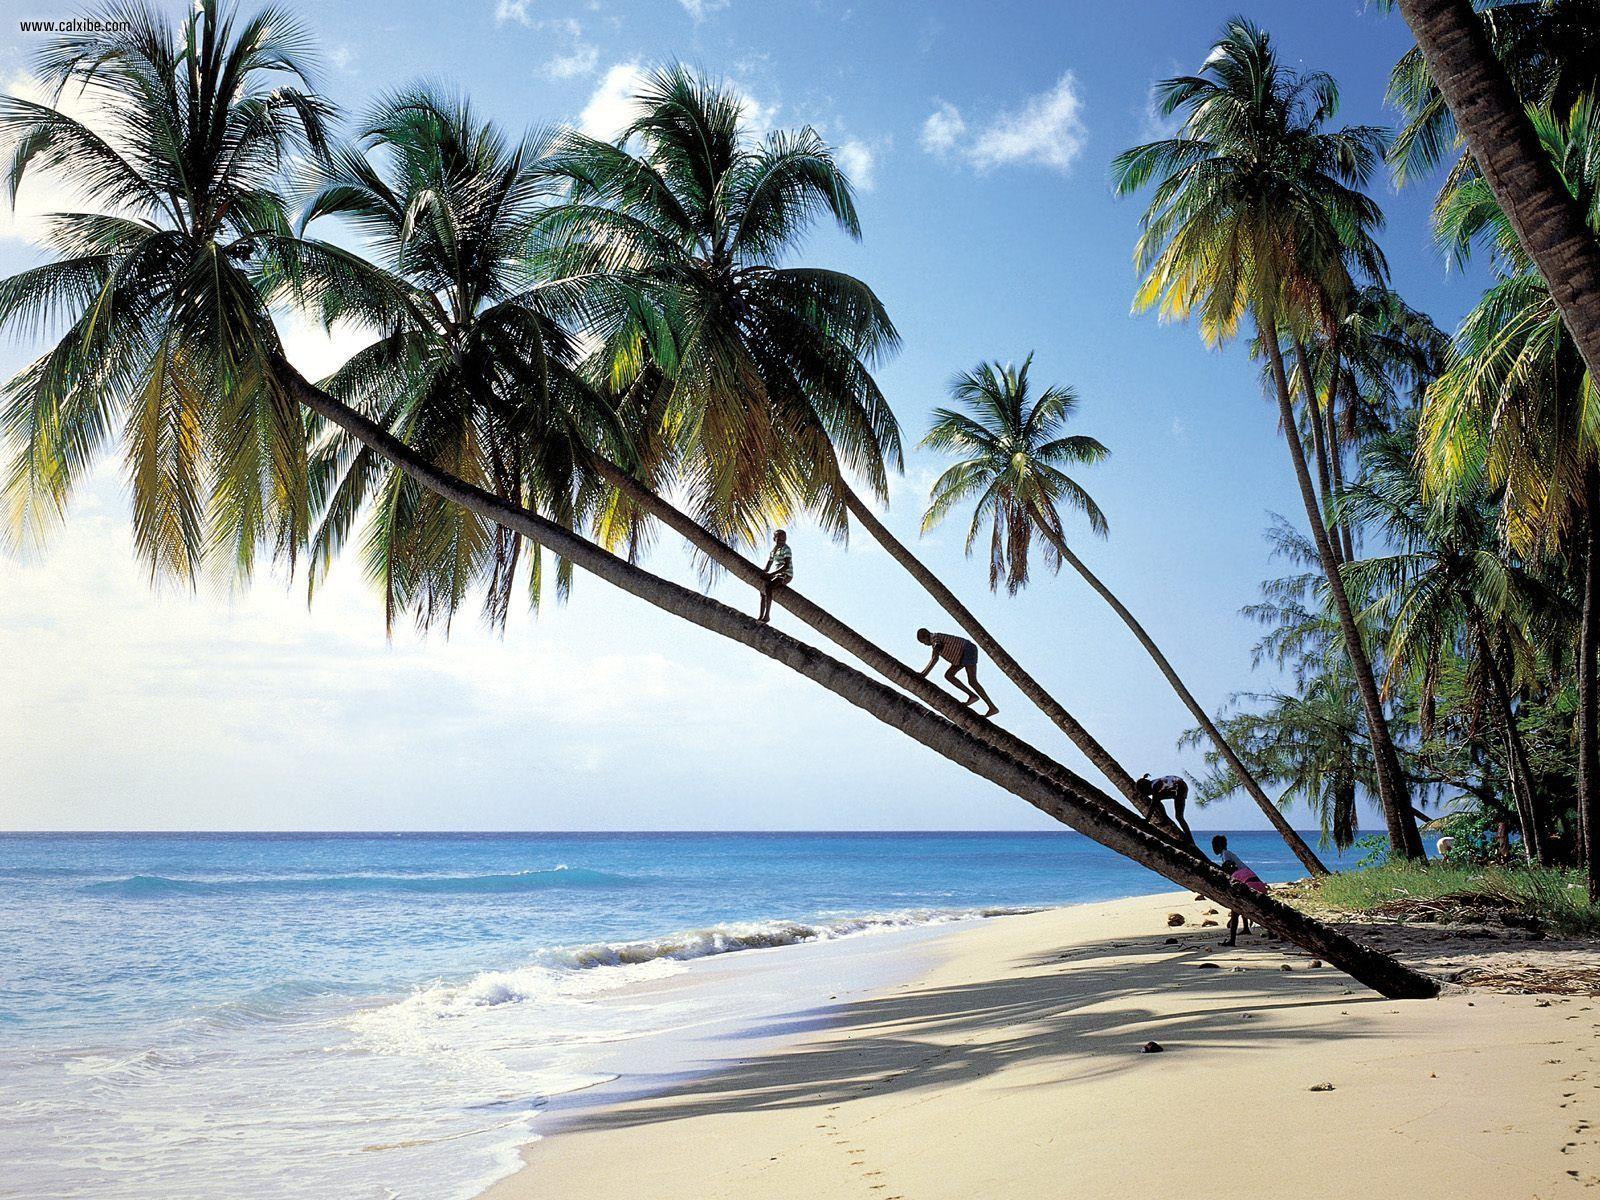 http://3.bp.blogspot.com/-LrDTL82Z-SY/T5gP5iCDWrI/AAAAAAAAADE/zL-fFFK79zs/s1600/Gibbs_Beach_Mullins_Bay_Barbados.jpg